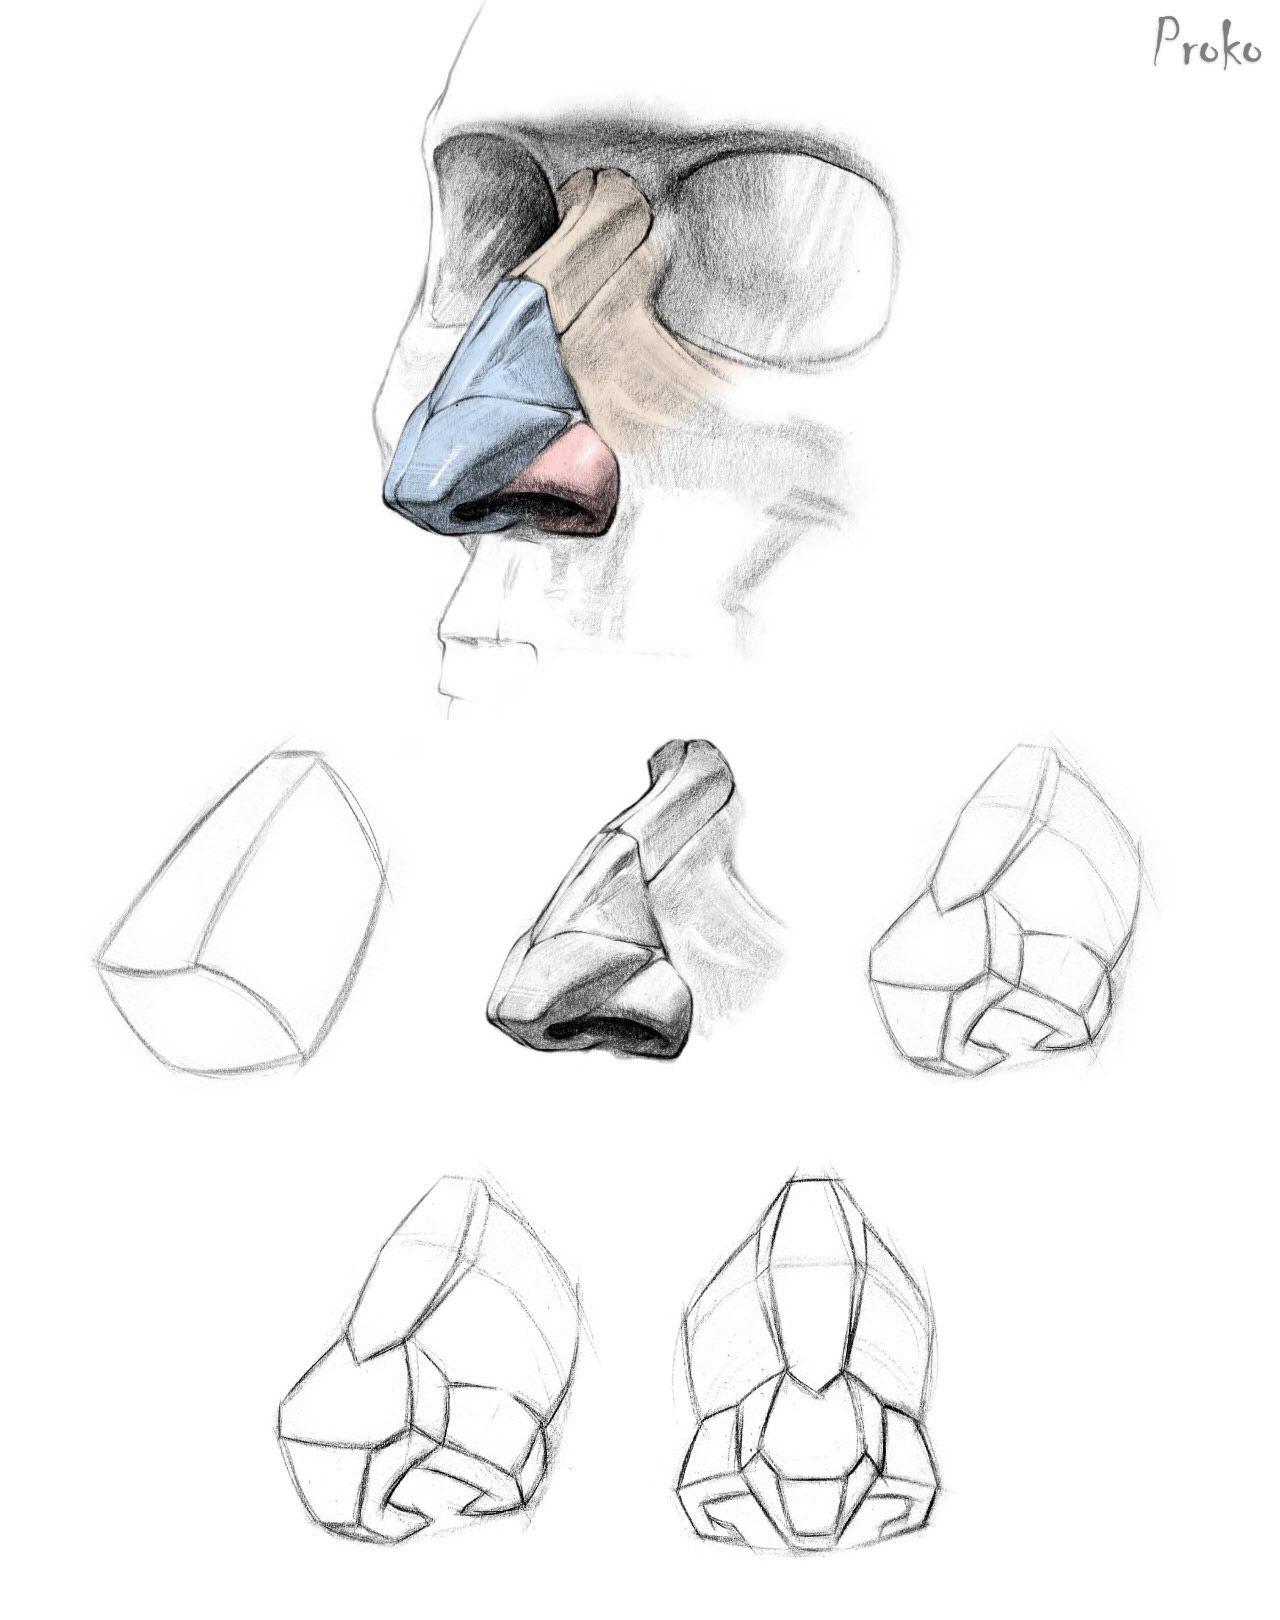 Pin By Johnnie Piriyapong On Cg 3d Anatomystudy In